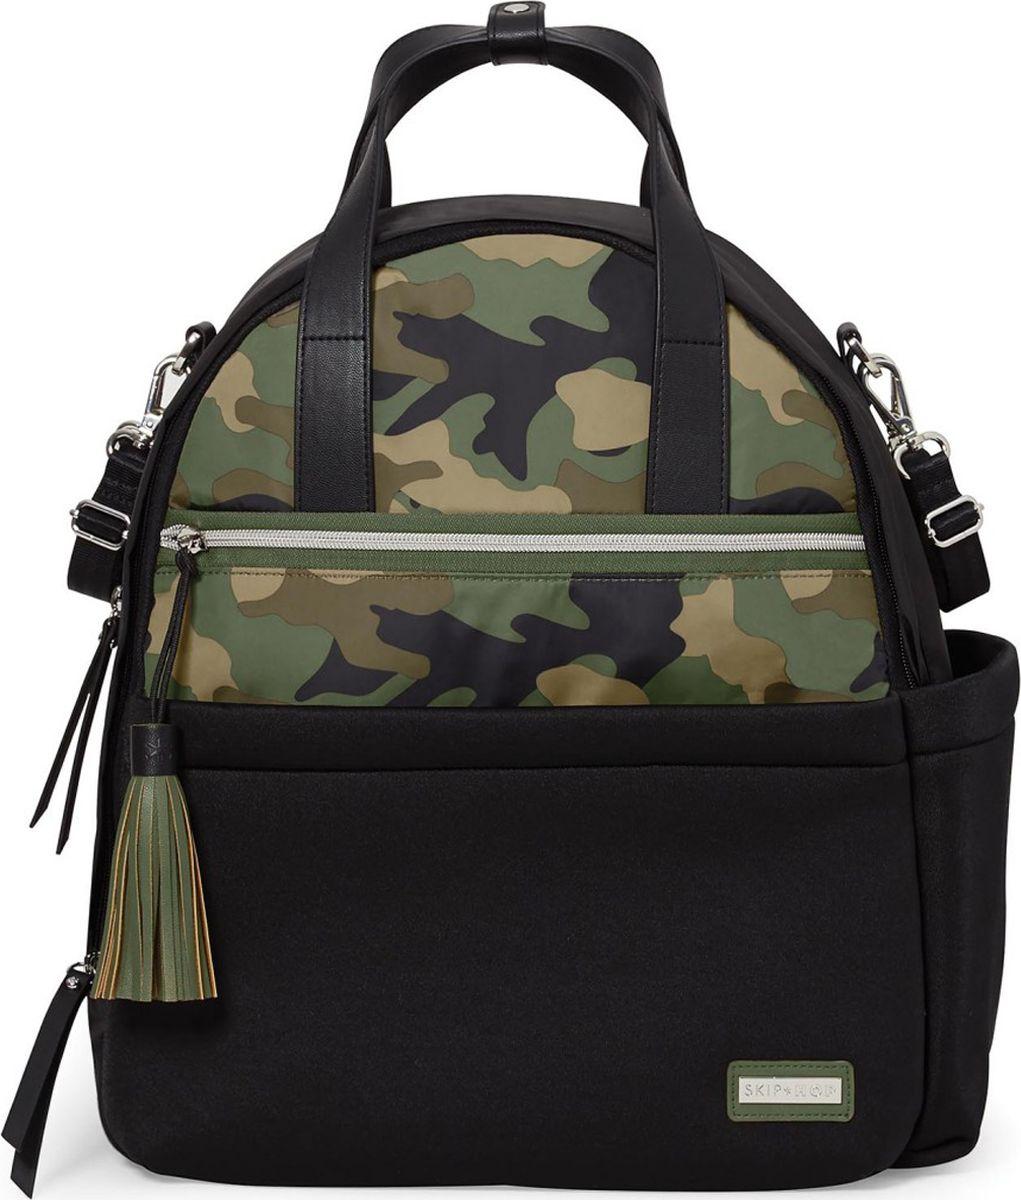 Skip Hop Рюкзак для мамы Nolita Neoprene Diaper Backpack цвет черный зеленый SH 204303 backpack diaper bag